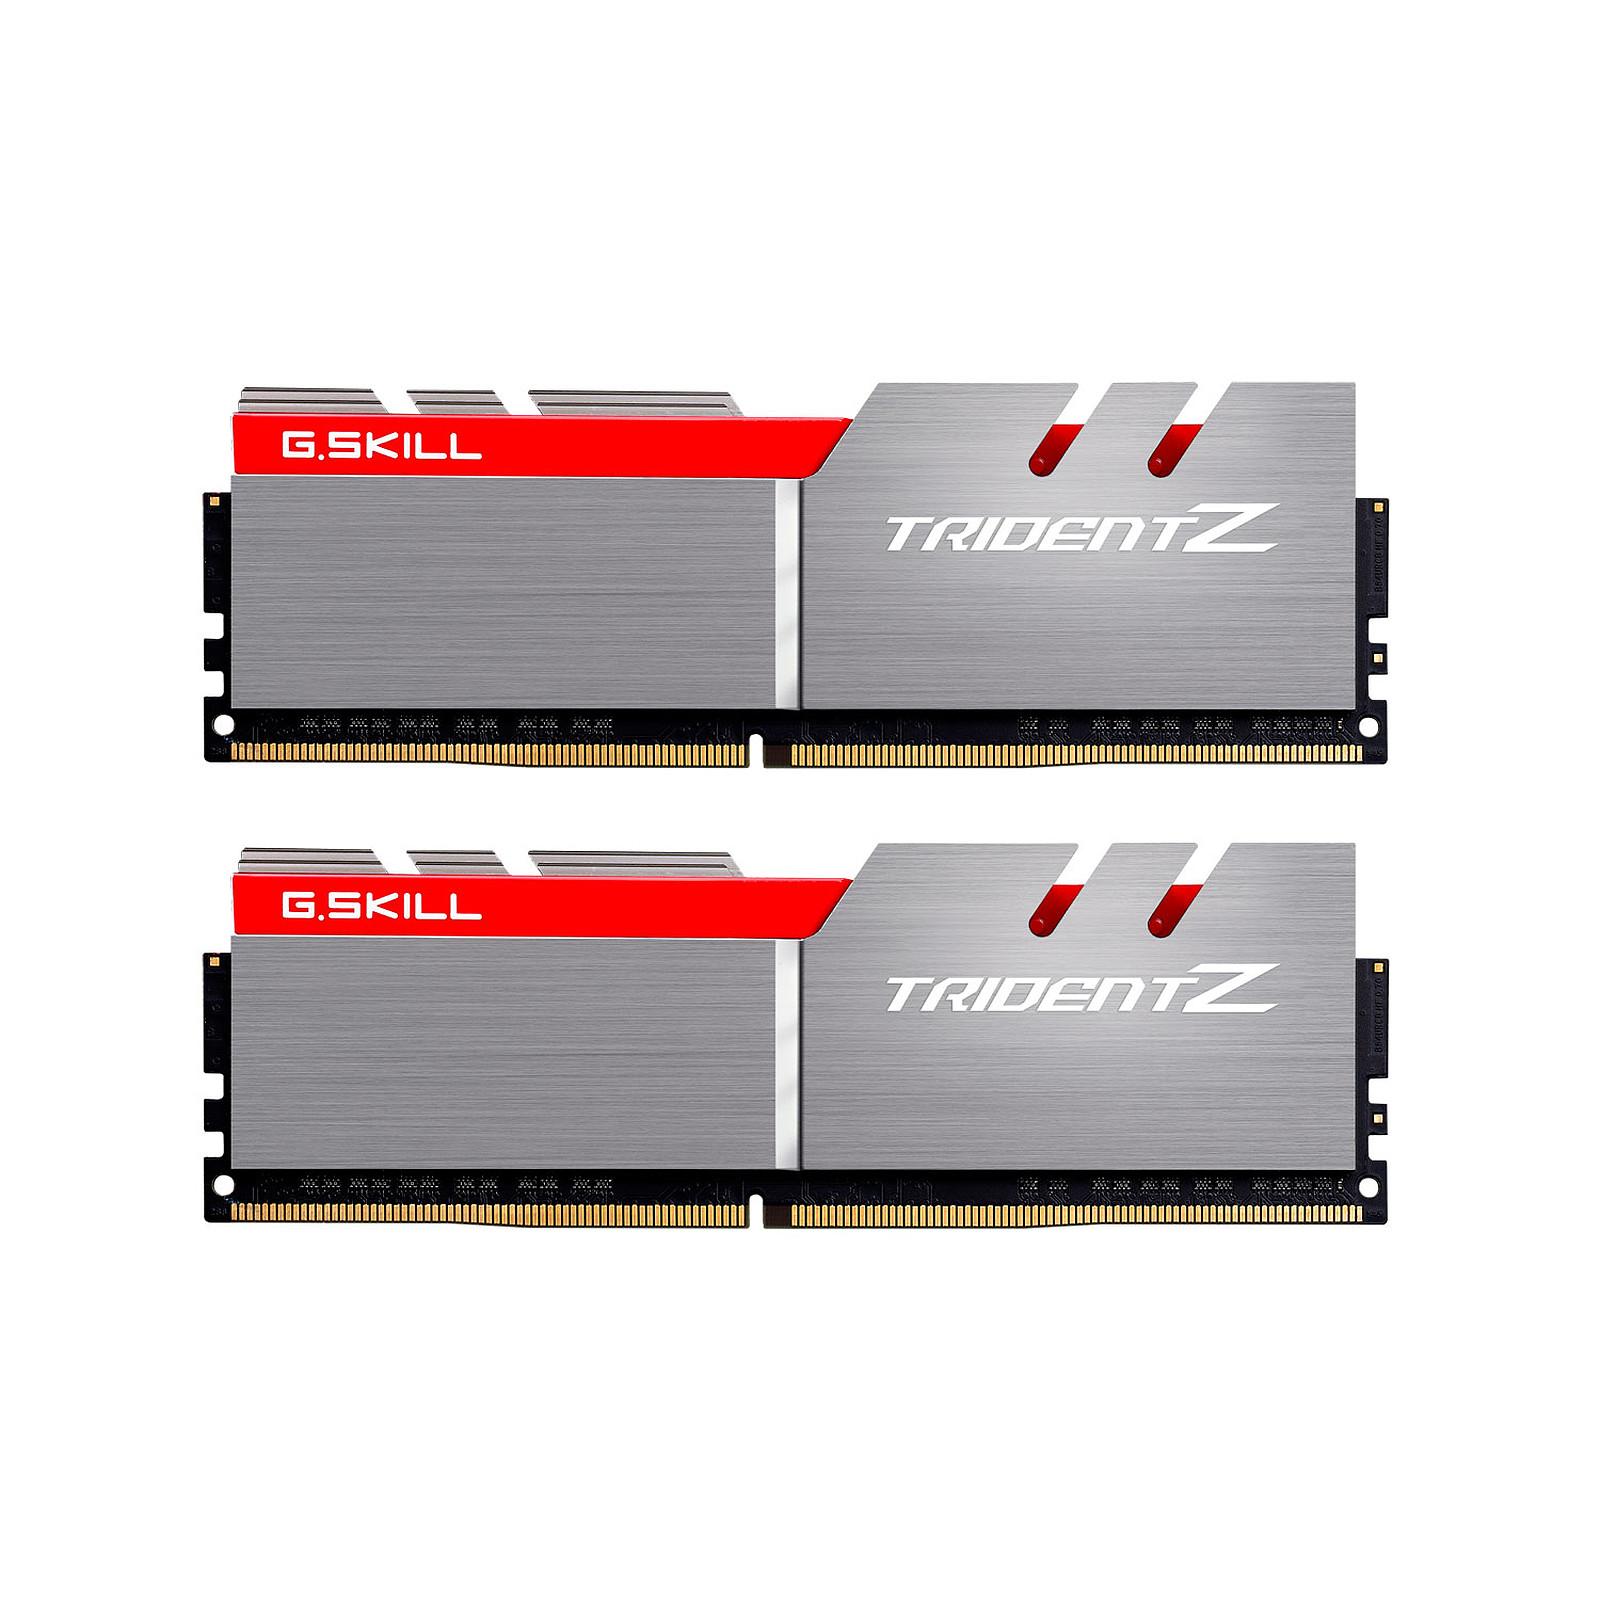 G.Skill Trident Z 8 Go (2x 4 Go) DDR4 4266 MHz CL19